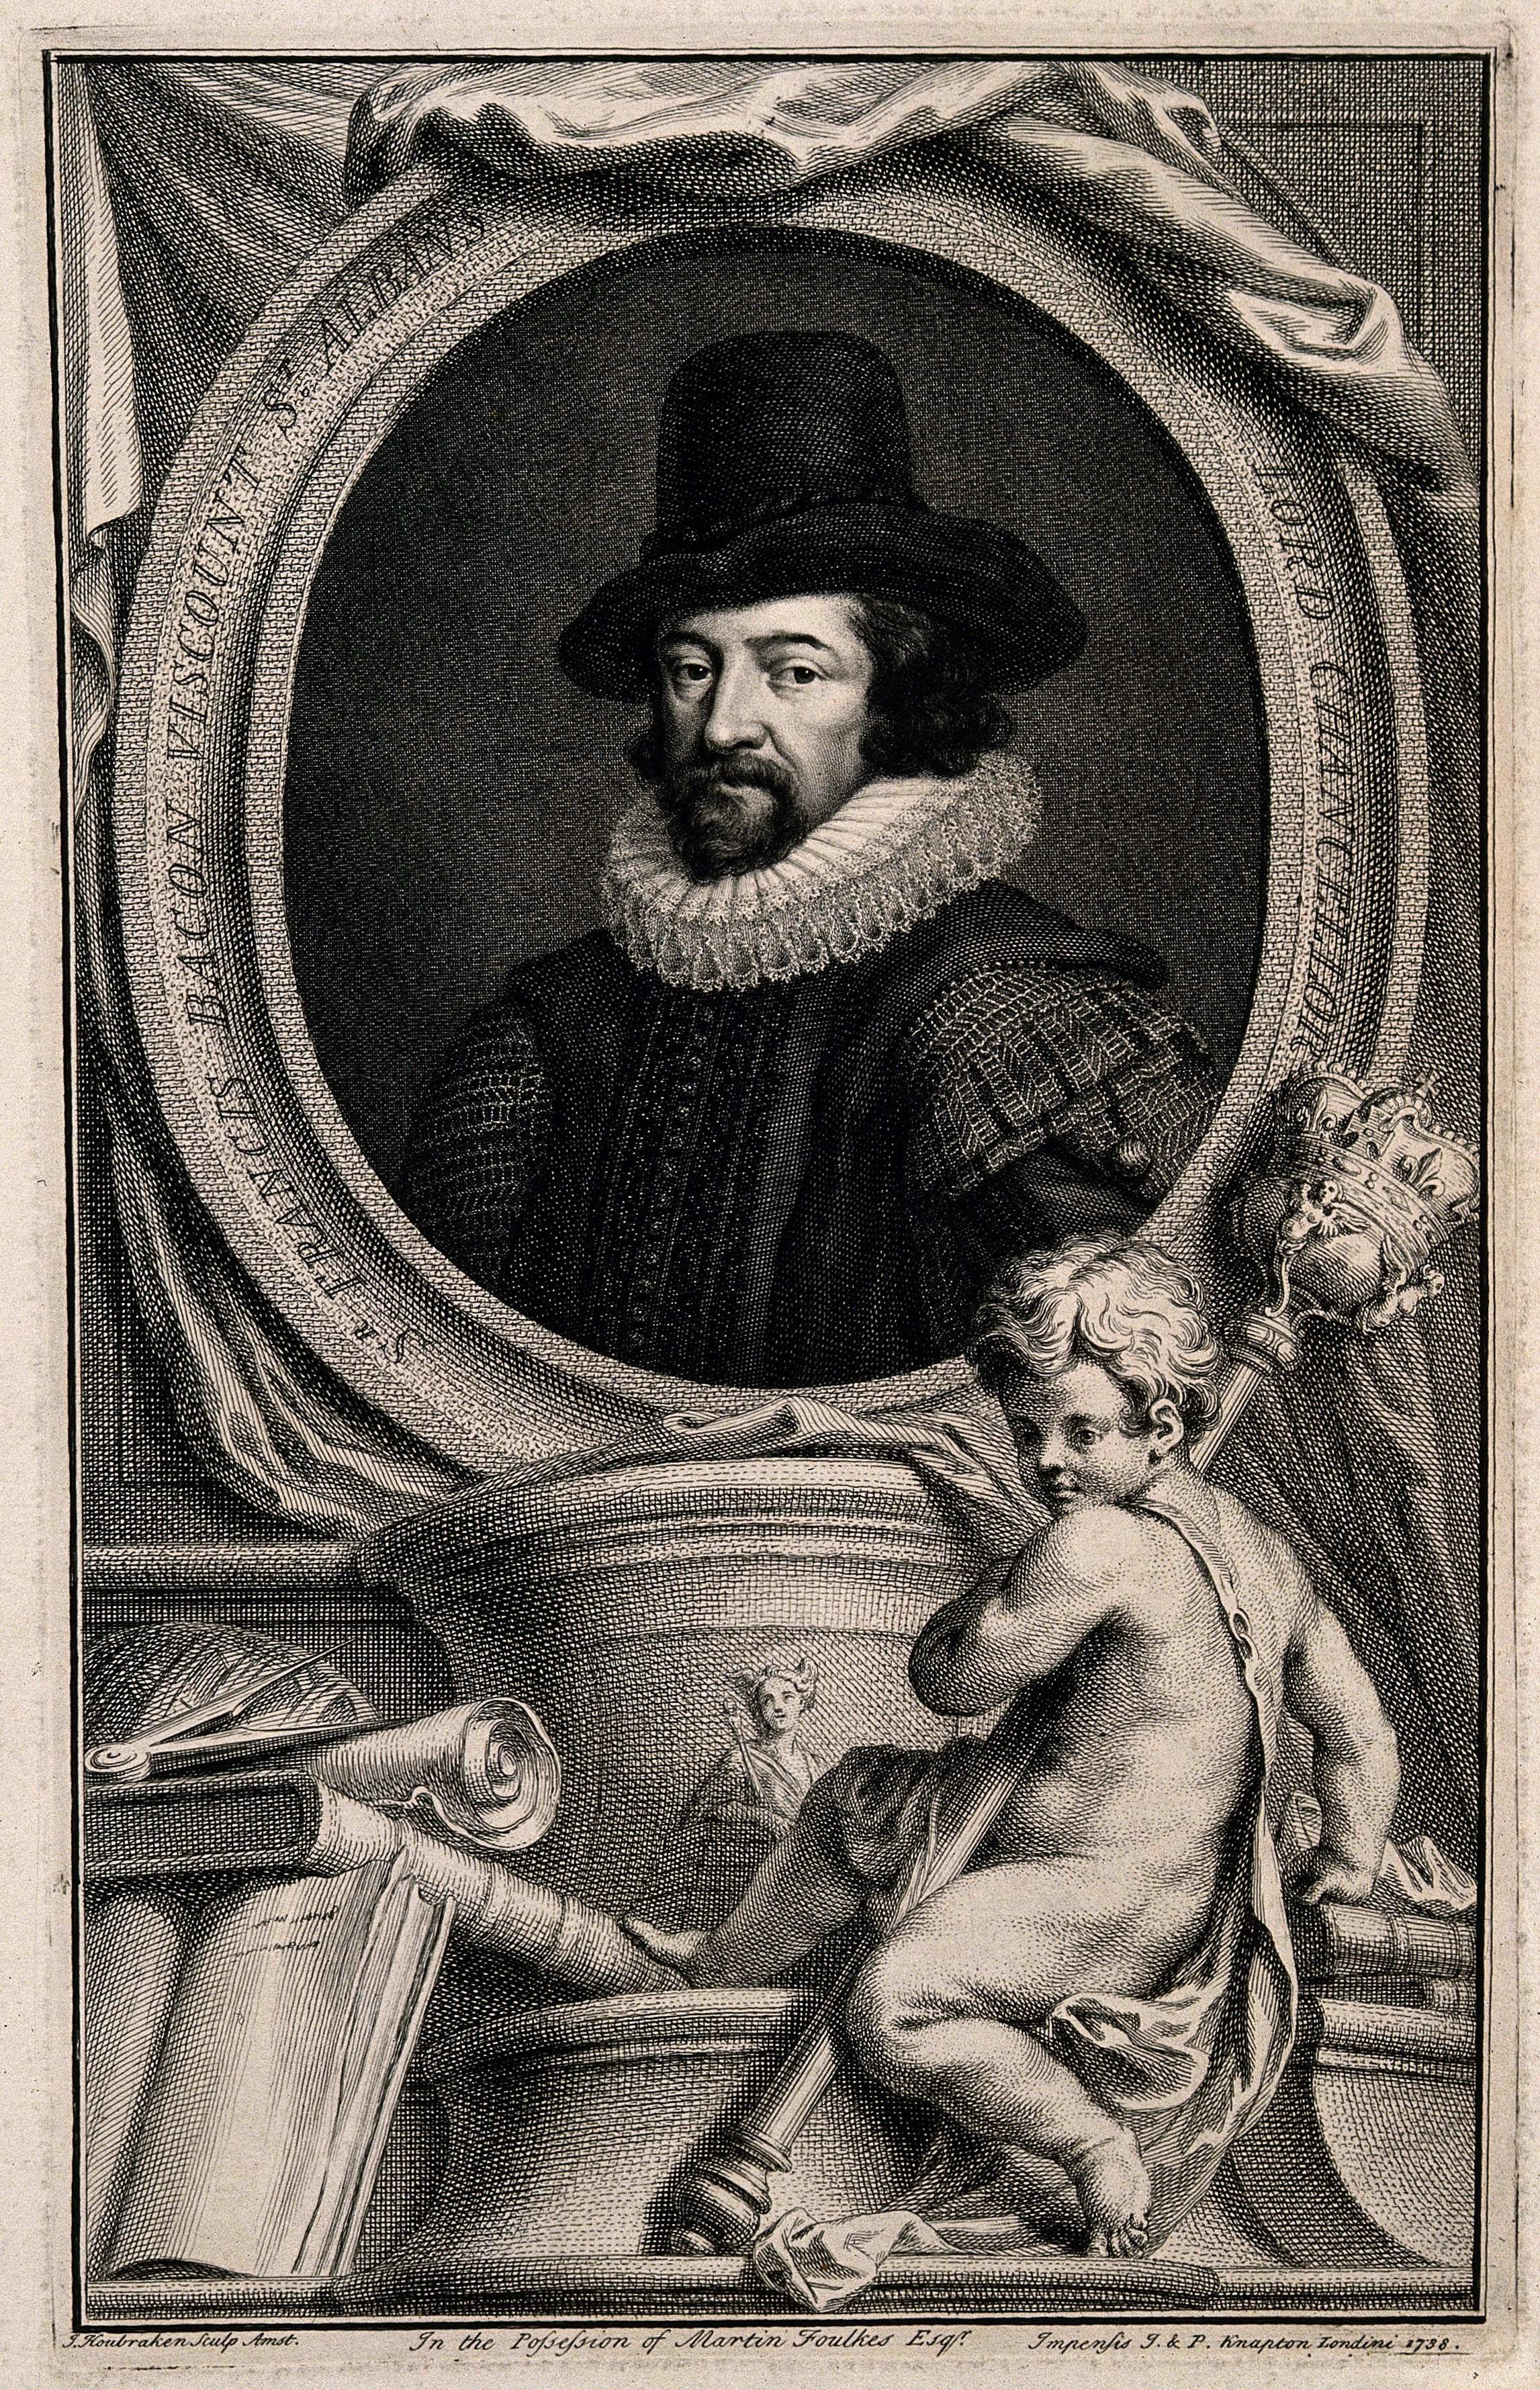 Francis_Bacon,_Viscount_St_Albans._Line_engraving_by_J._Houb_Wellcome_V0000263.jpg